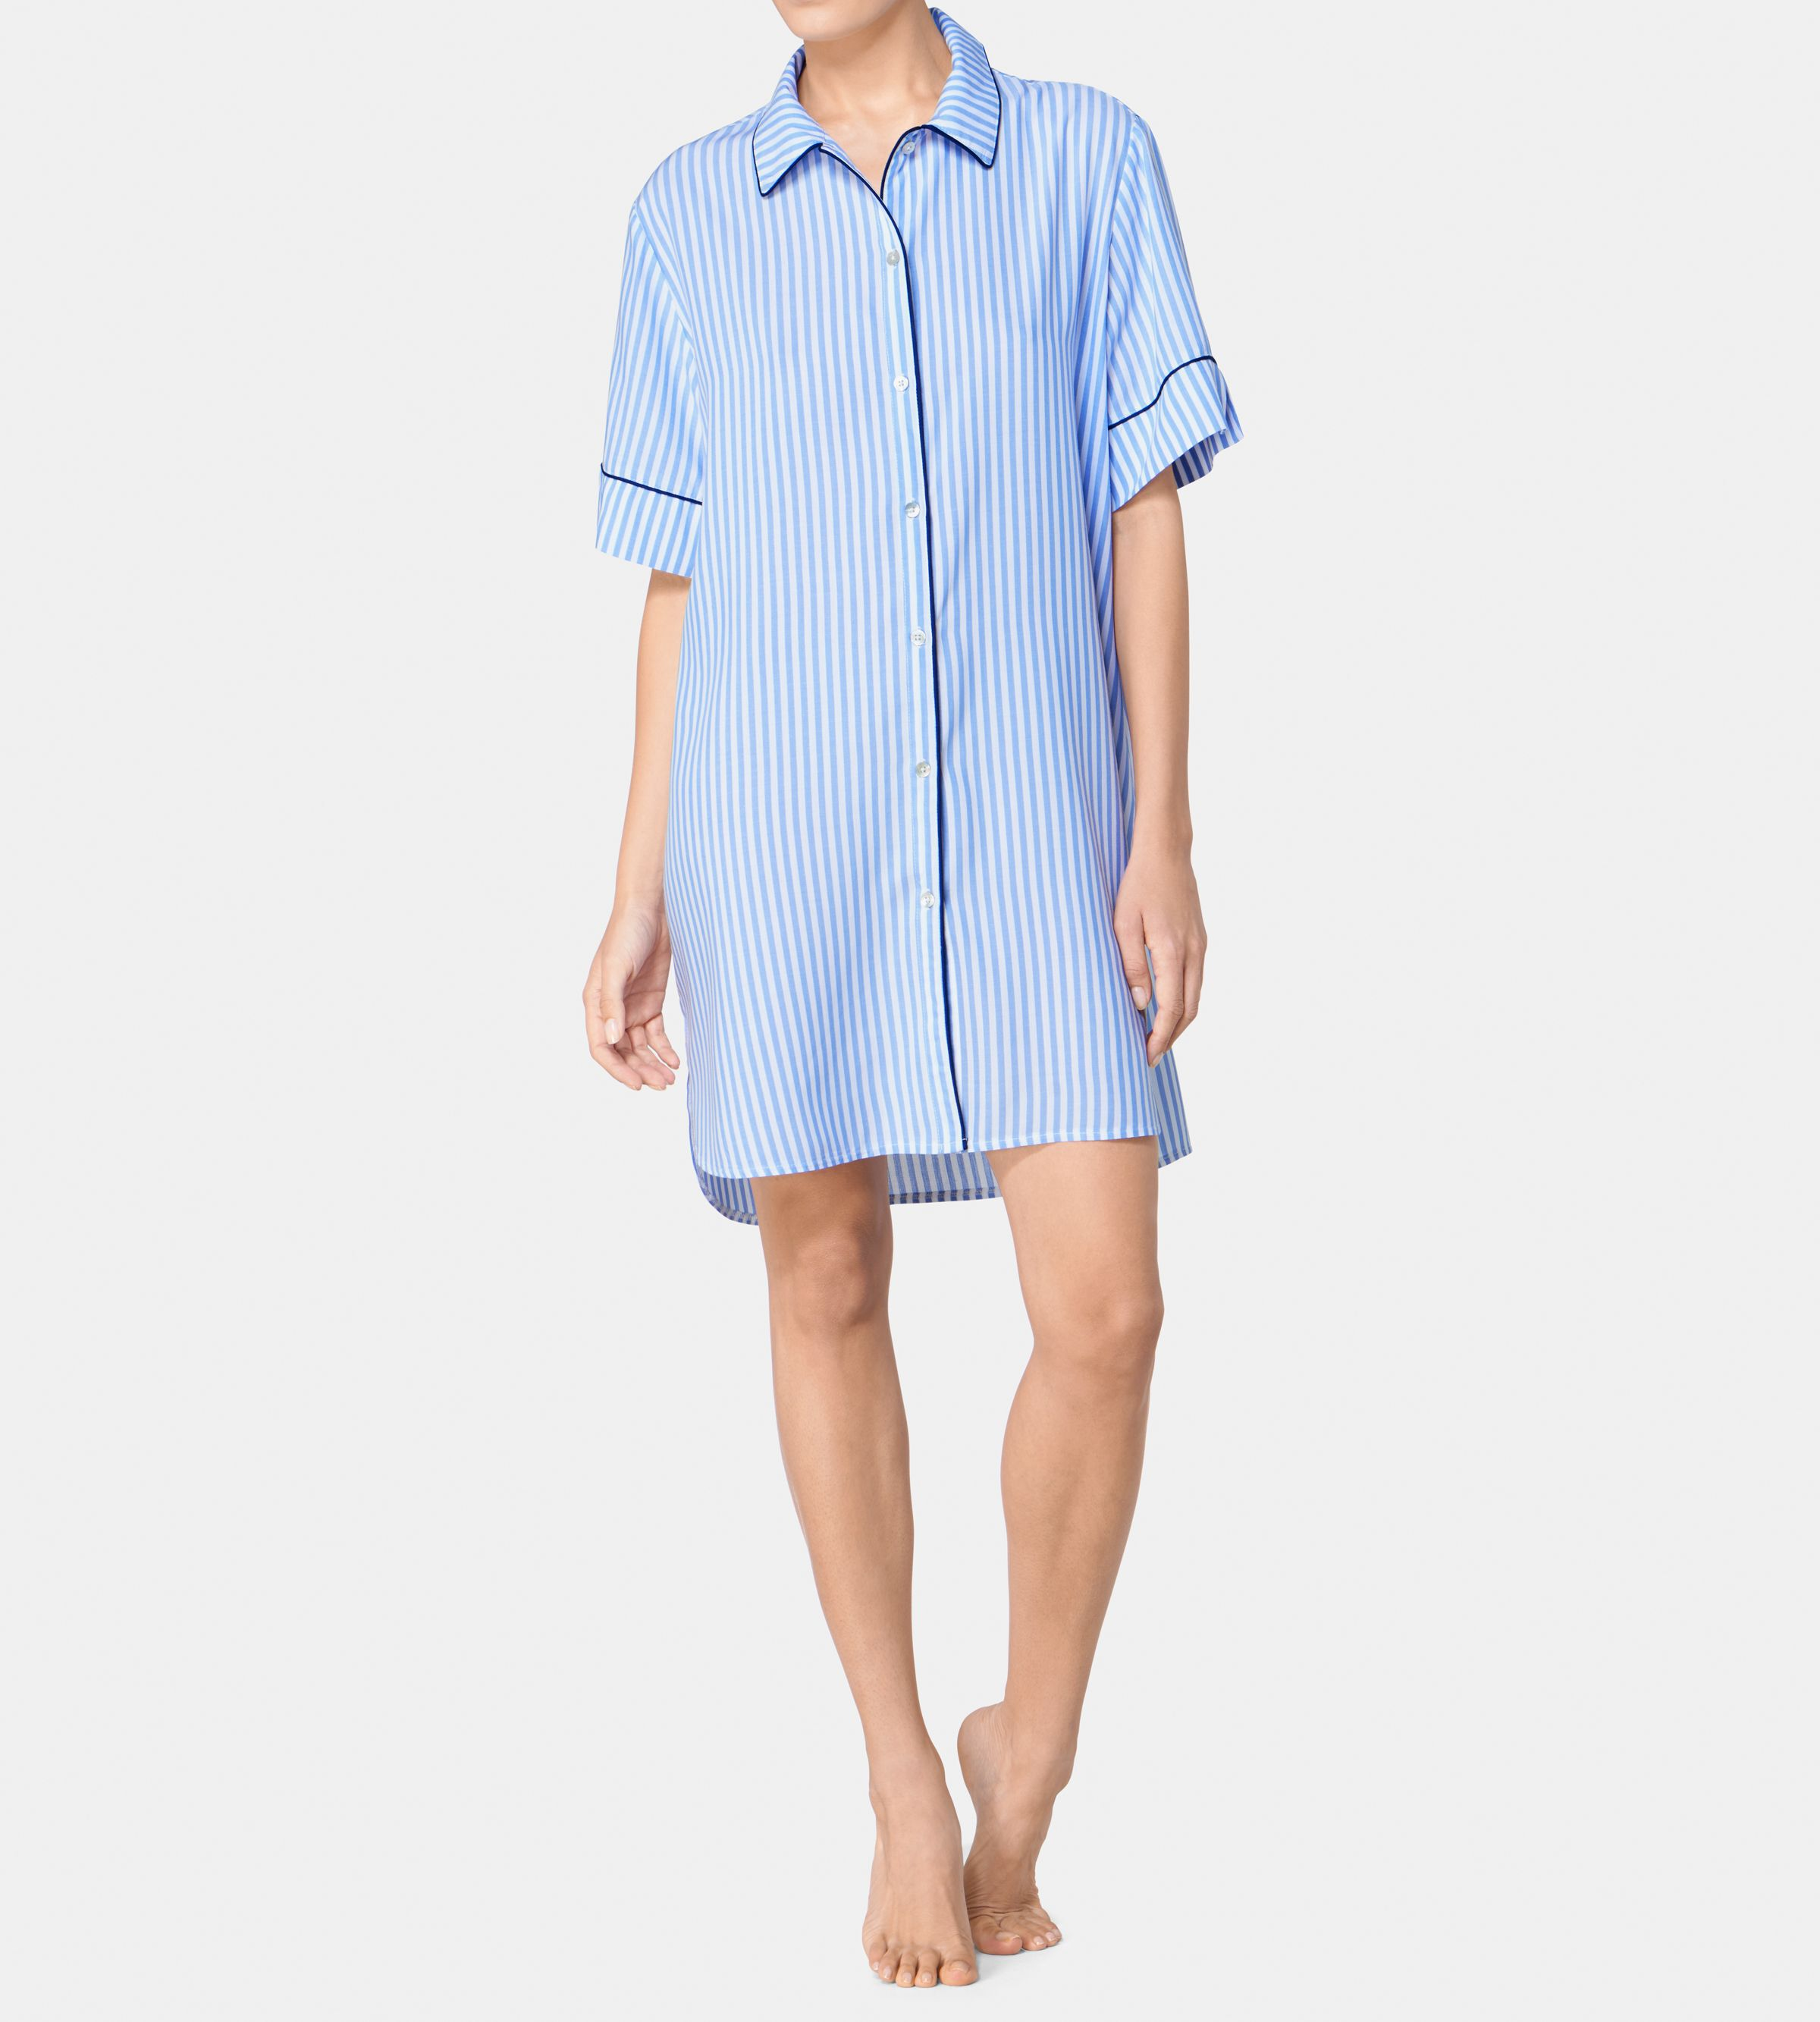 Triumph Women's Chemis Ss18 Ndw Short Nightie Fashion Style Cheap Price Y0sfivr